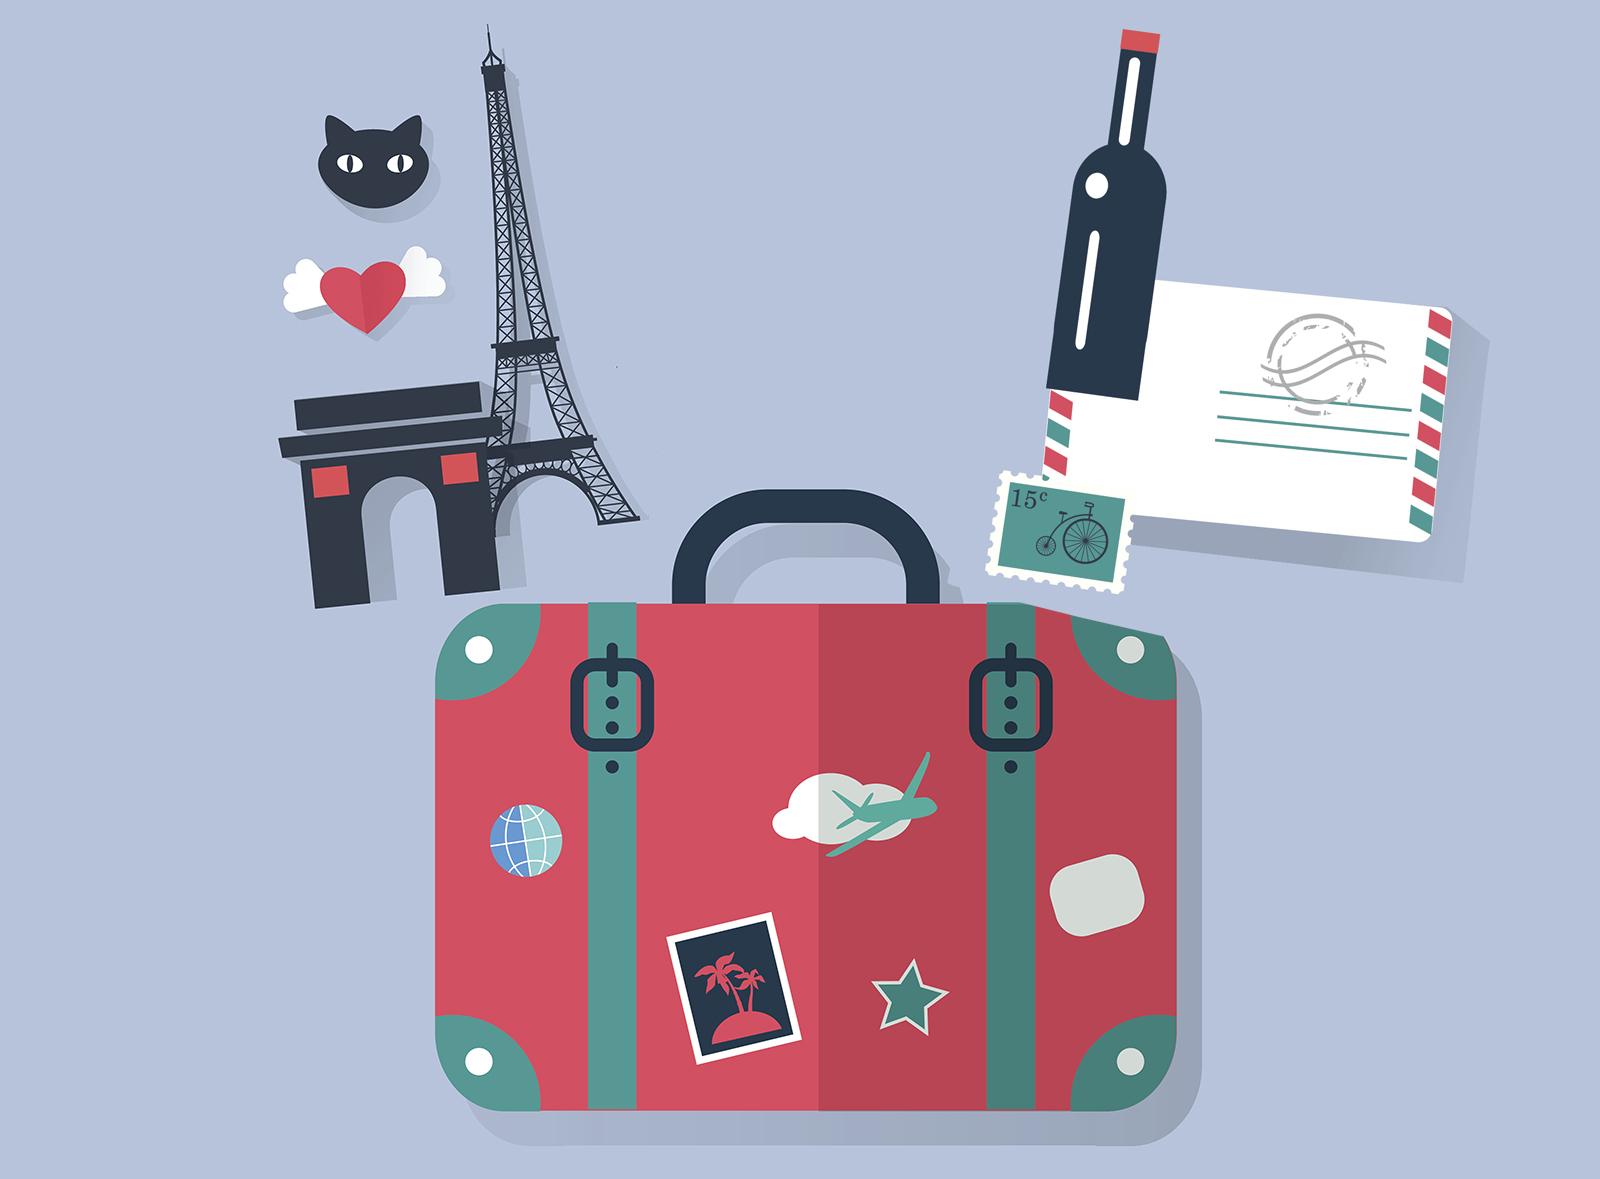 borond_utazas_souvenir_palack_istock_1600.jpg